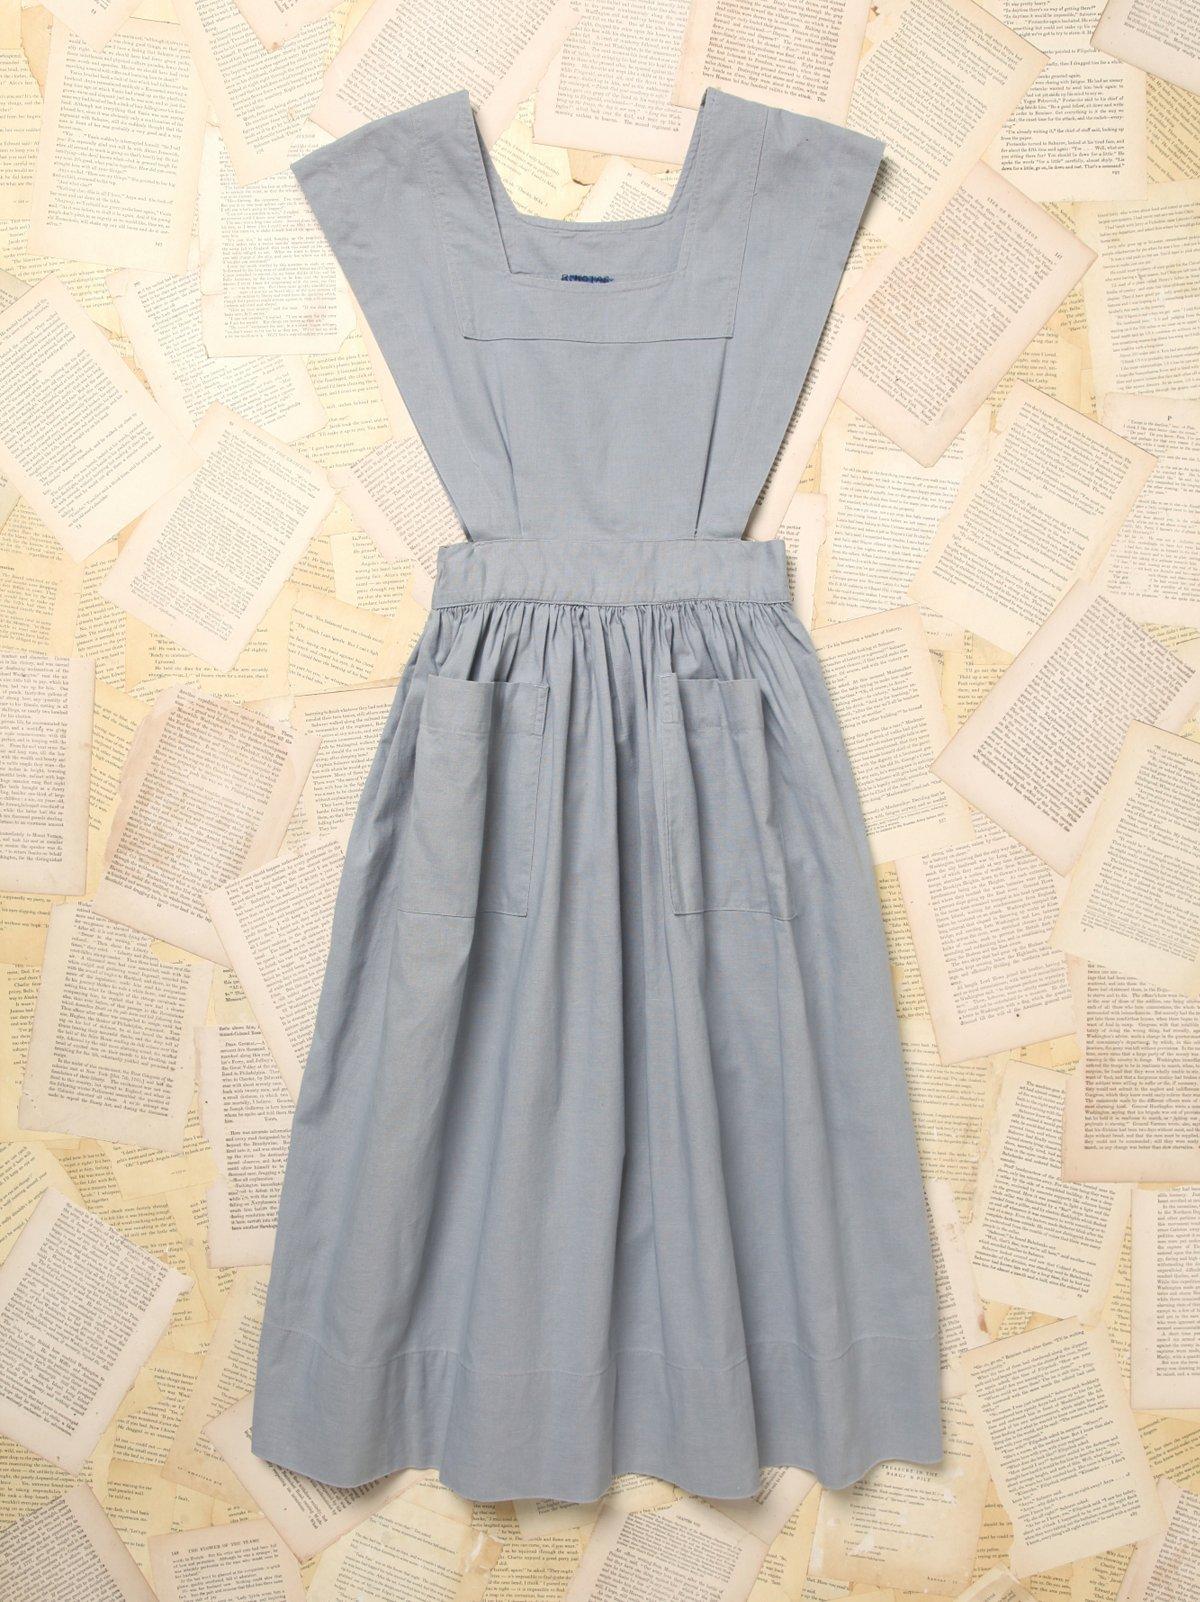 Vintage Chambray Dress